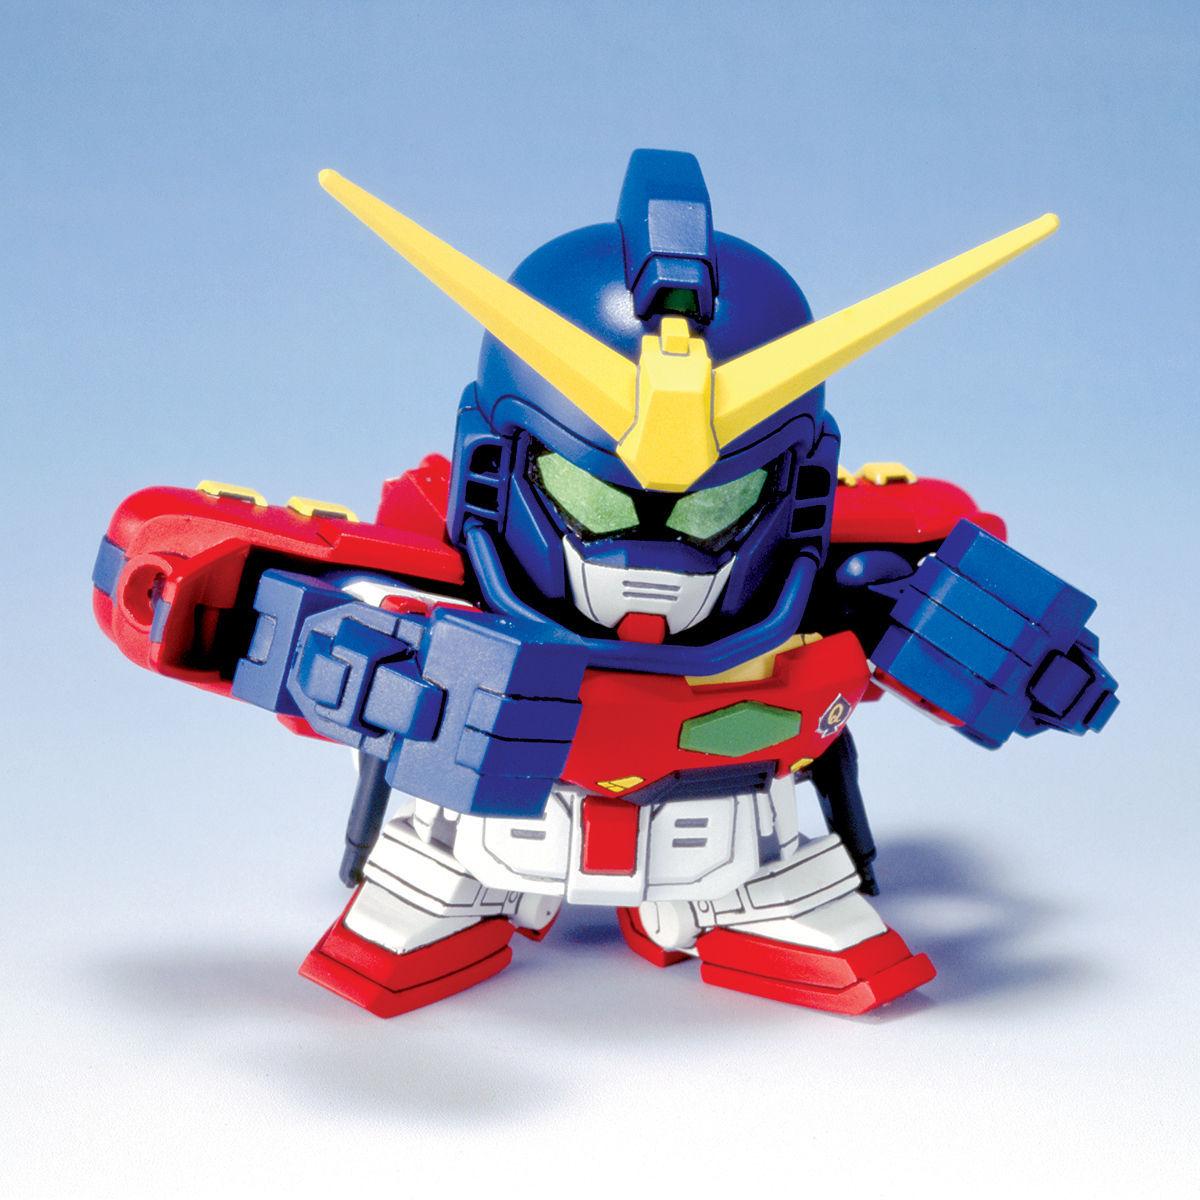 96583SDガンダム GジェネレーションZERO(GGENERATION-0) 027 GF13-006NA ガンダムマックスター(ファイティングナックルモード) [Gundam Maxter (Fighting Knuckle Mode)]